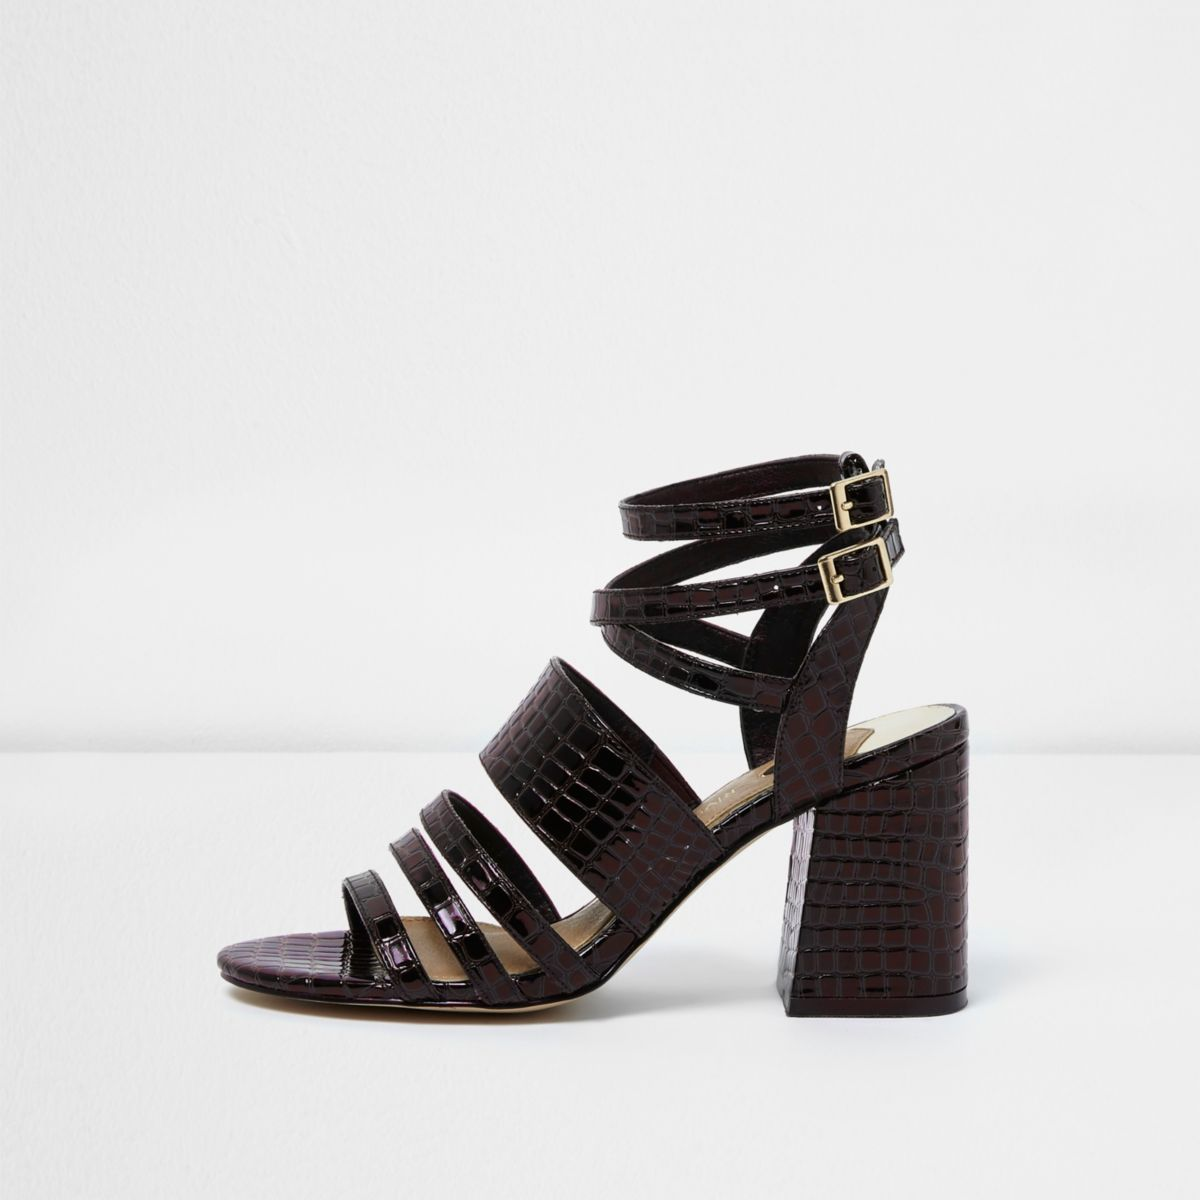 Brown croc strappy block heel sandals